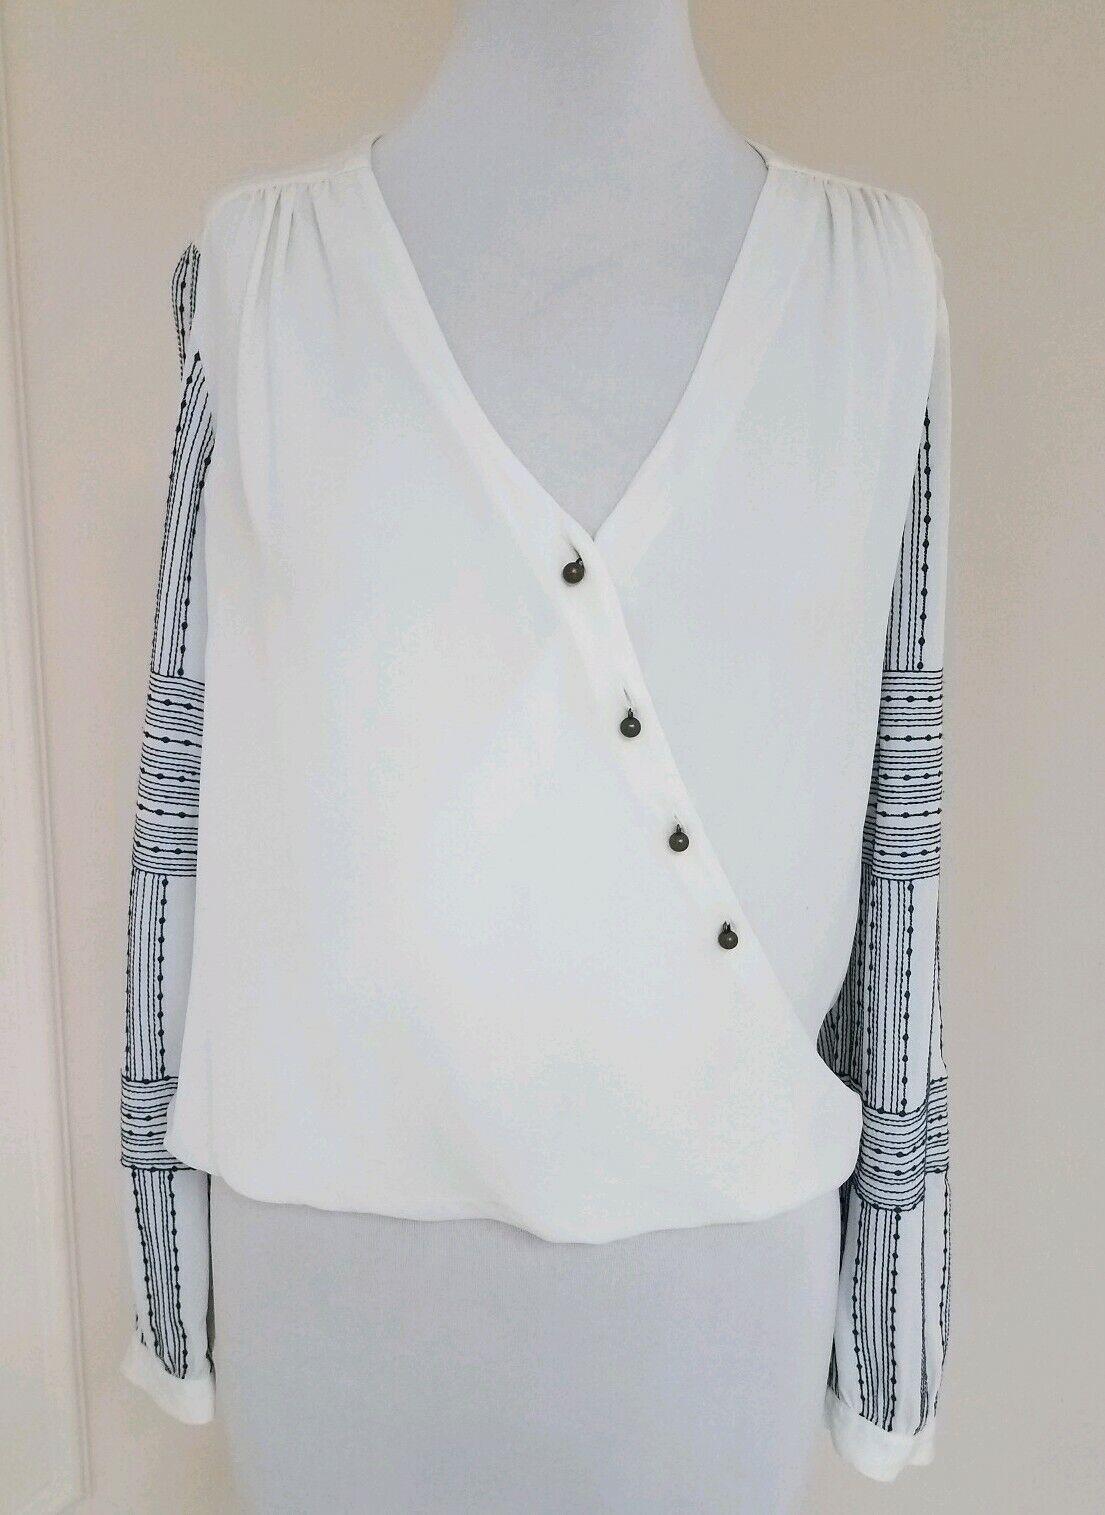 Veronica Beard Blouse Cream Embroidered Sleeve Silk Size  Bohemian Surplice Top